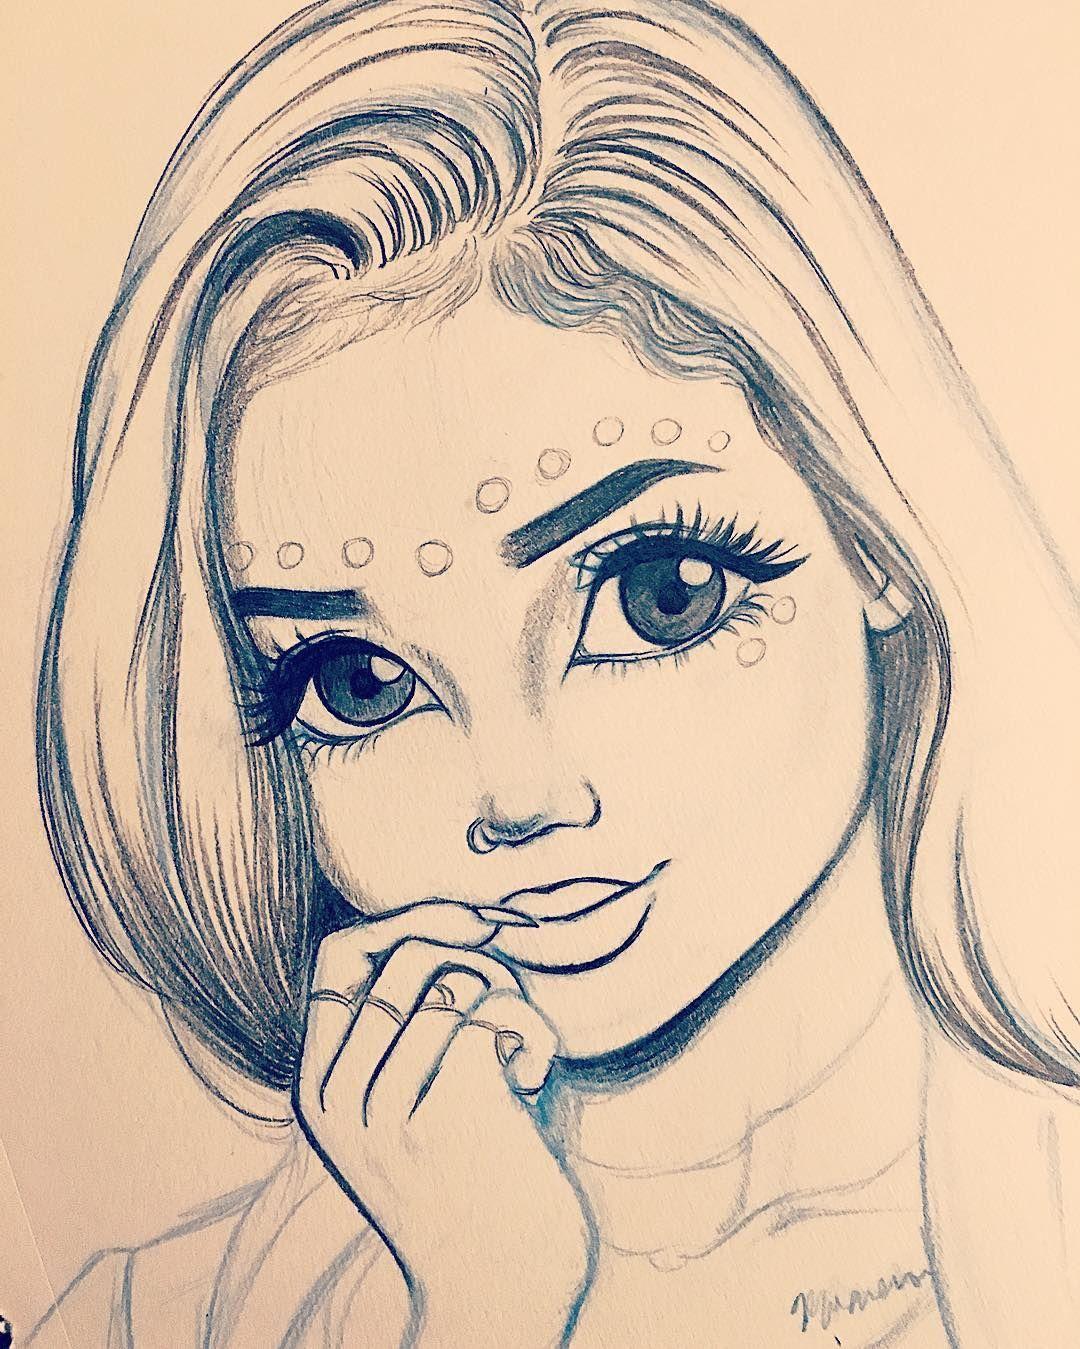 pιɴвαвy drαĸedrιpѕ {ғᴏʟʟᴏᴡ ᴛᴏ sᴇᴇ ᴍᴏʀᴇ}! Sketches, Girl